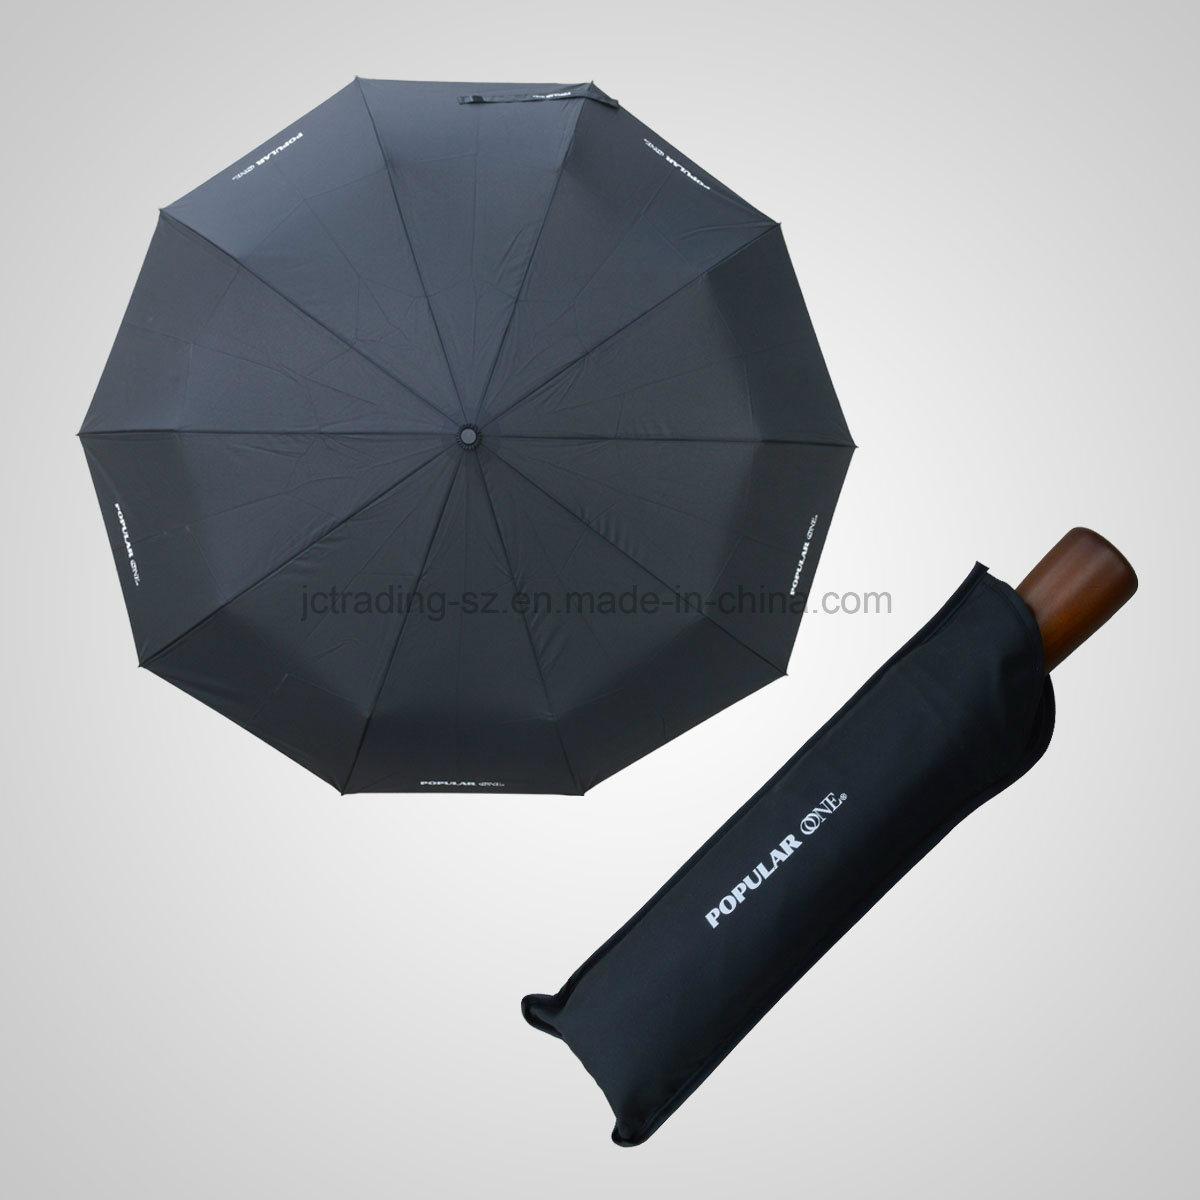 3 Fold Automatic Open&Close Golf Storm Umbrella (JF-AOC302)